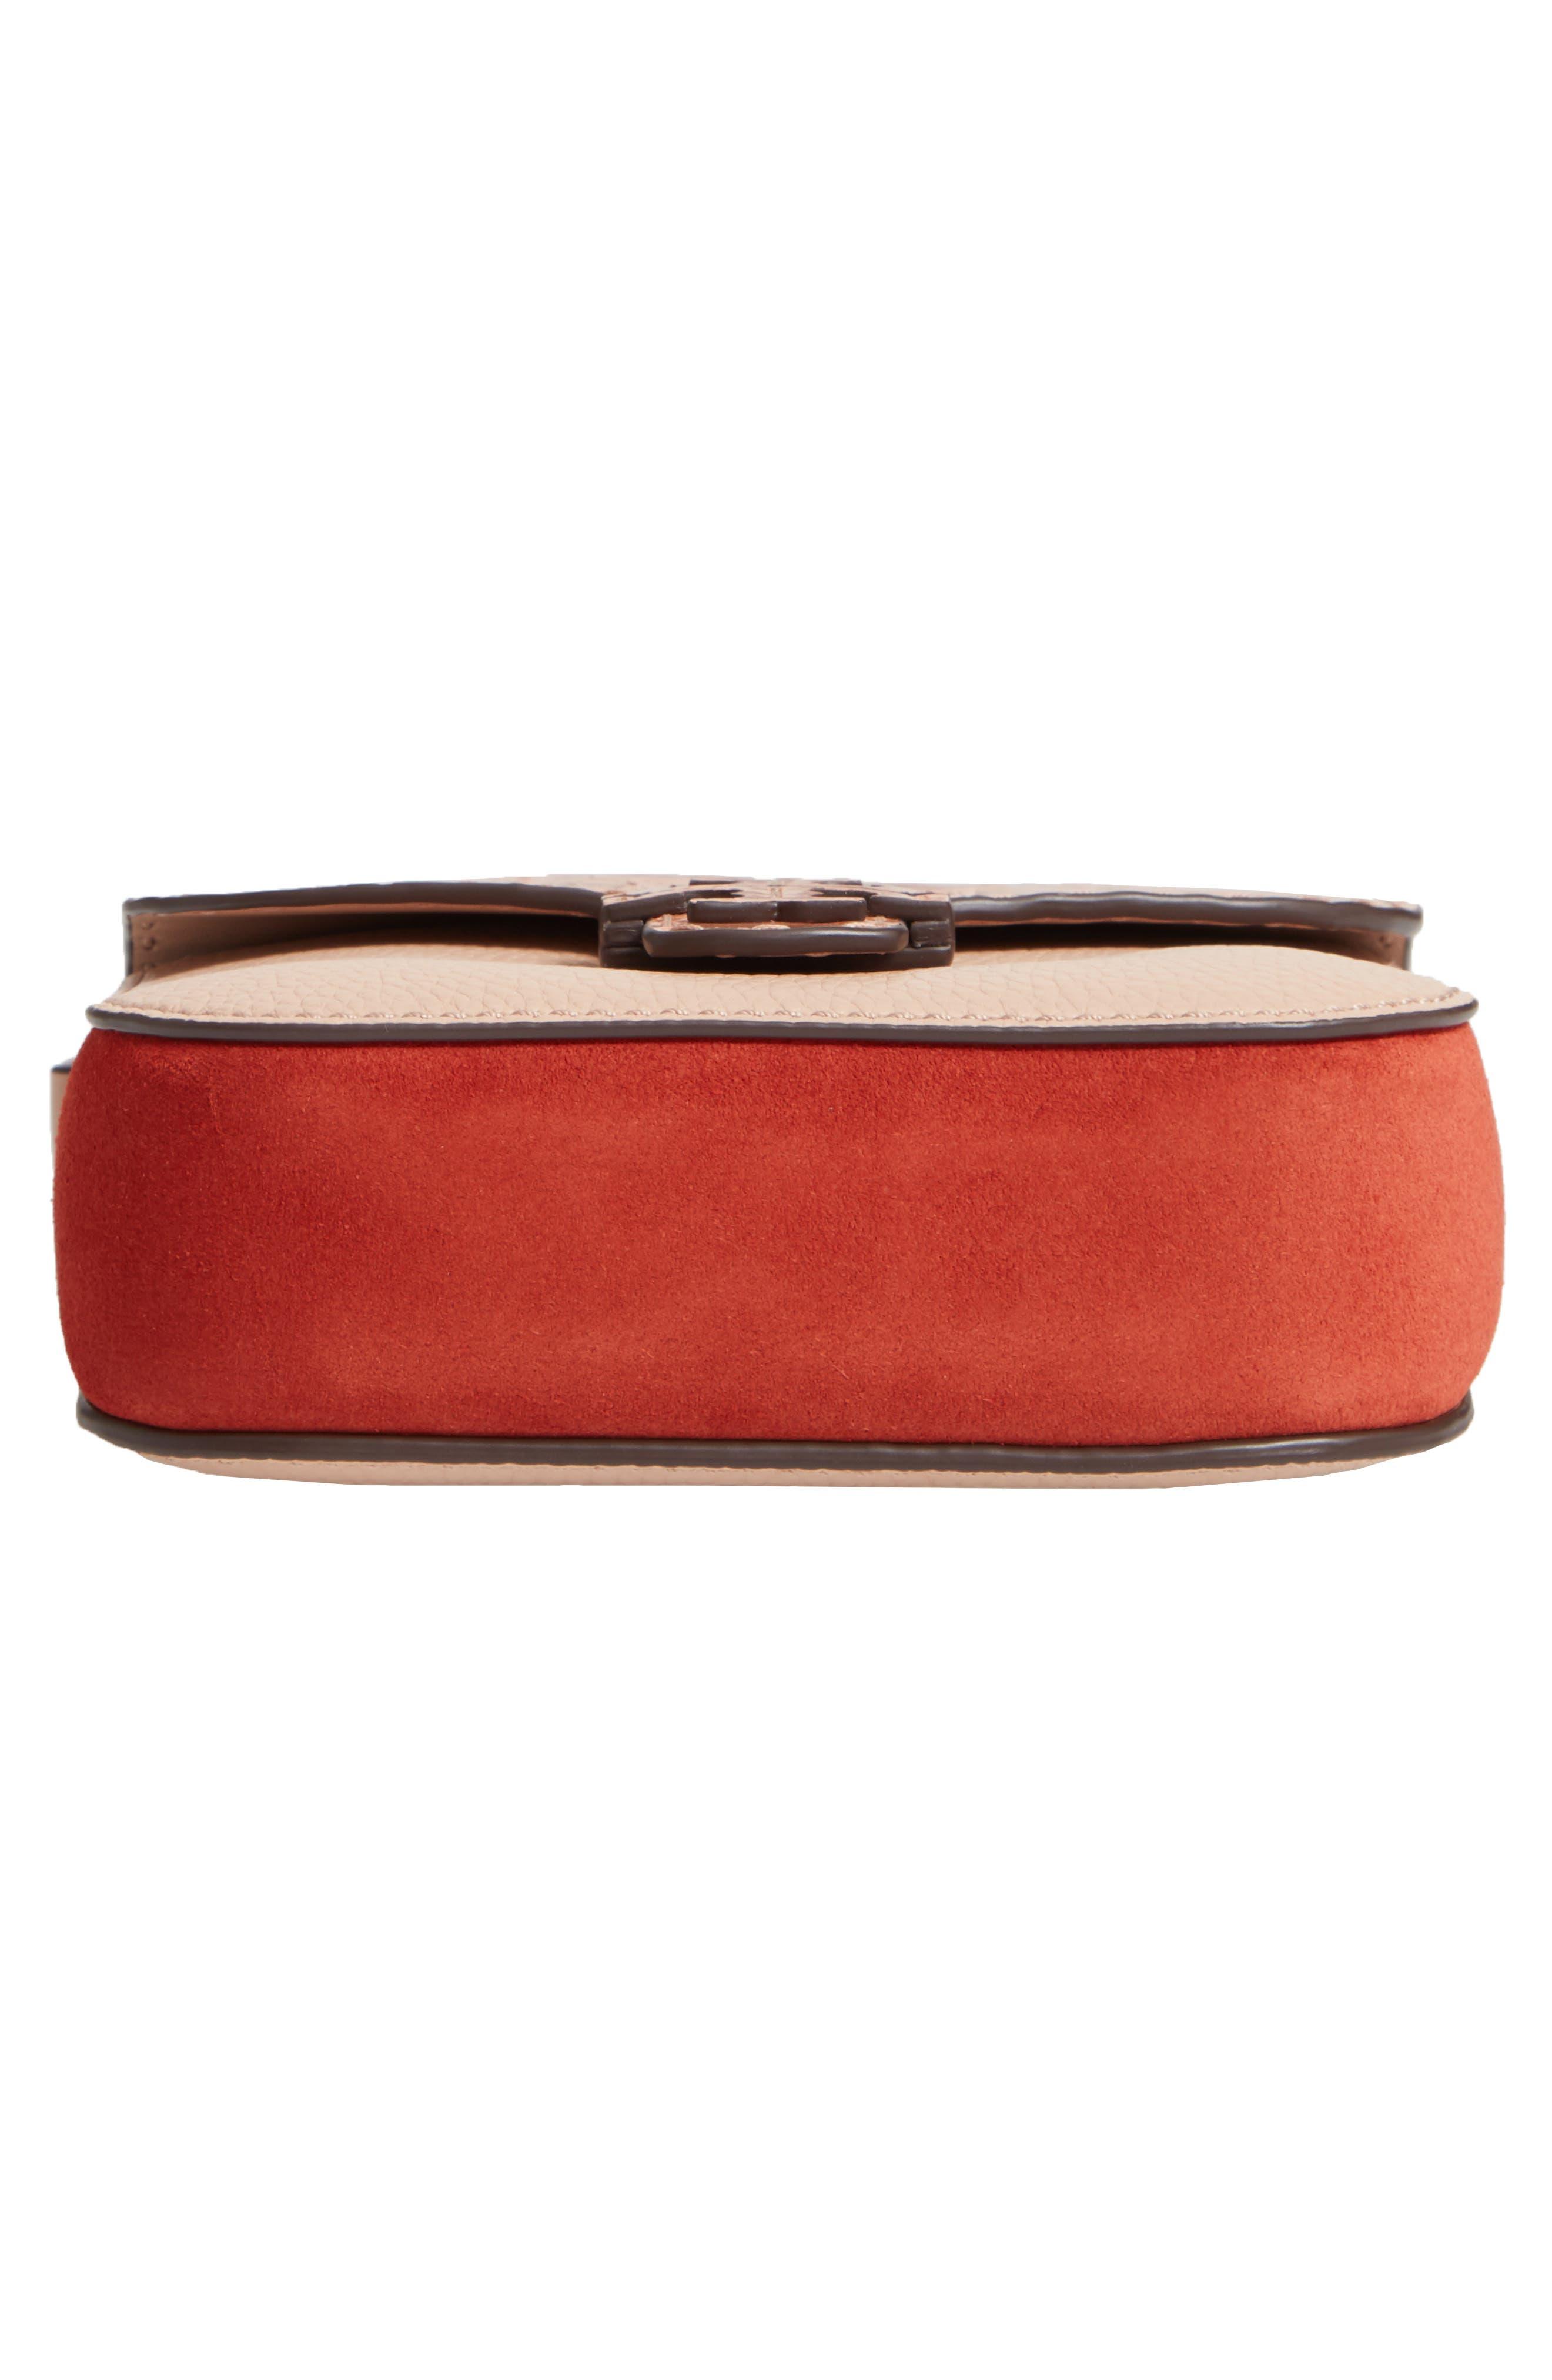 McGraw Croc Embossed Leather Crossbody Bag,                             Alternate thumbnail 6, color,                             200